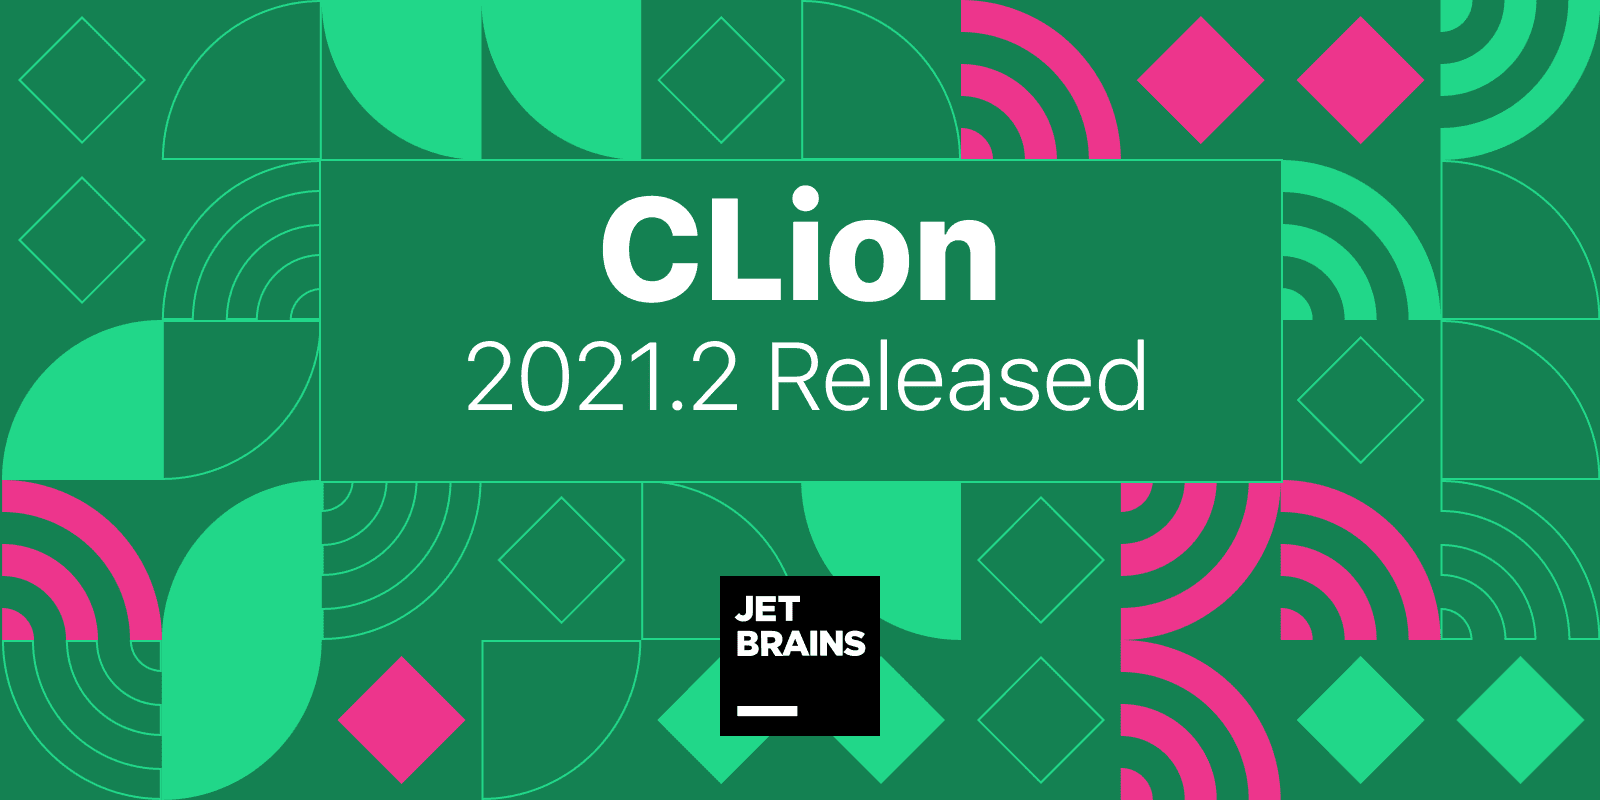 CLion 2021.2 release